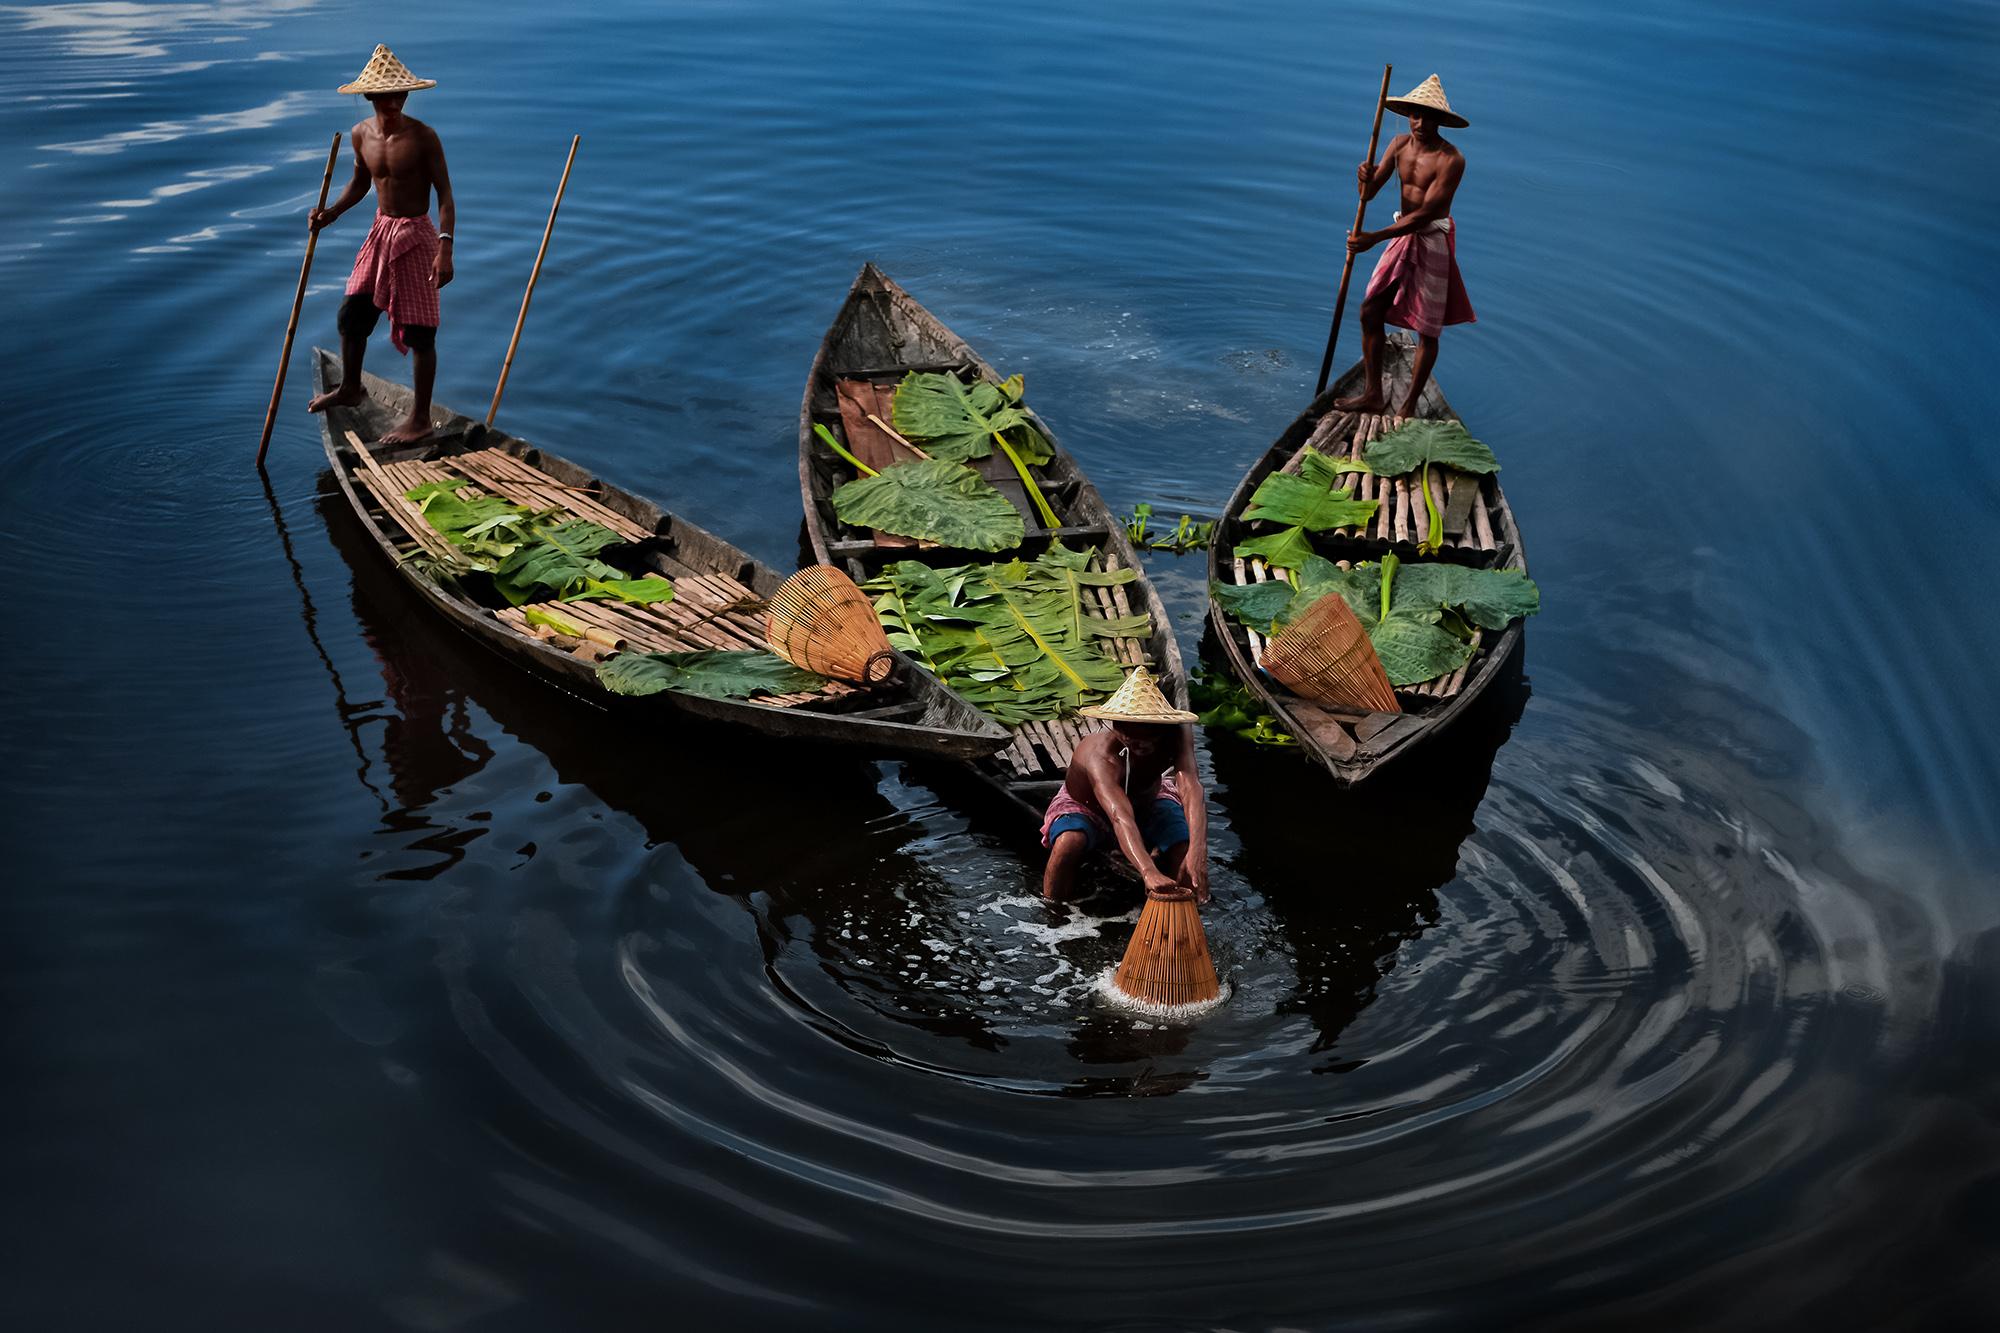 Sanjoy Bhattacharya EFIAP (India) - The story of fishermen